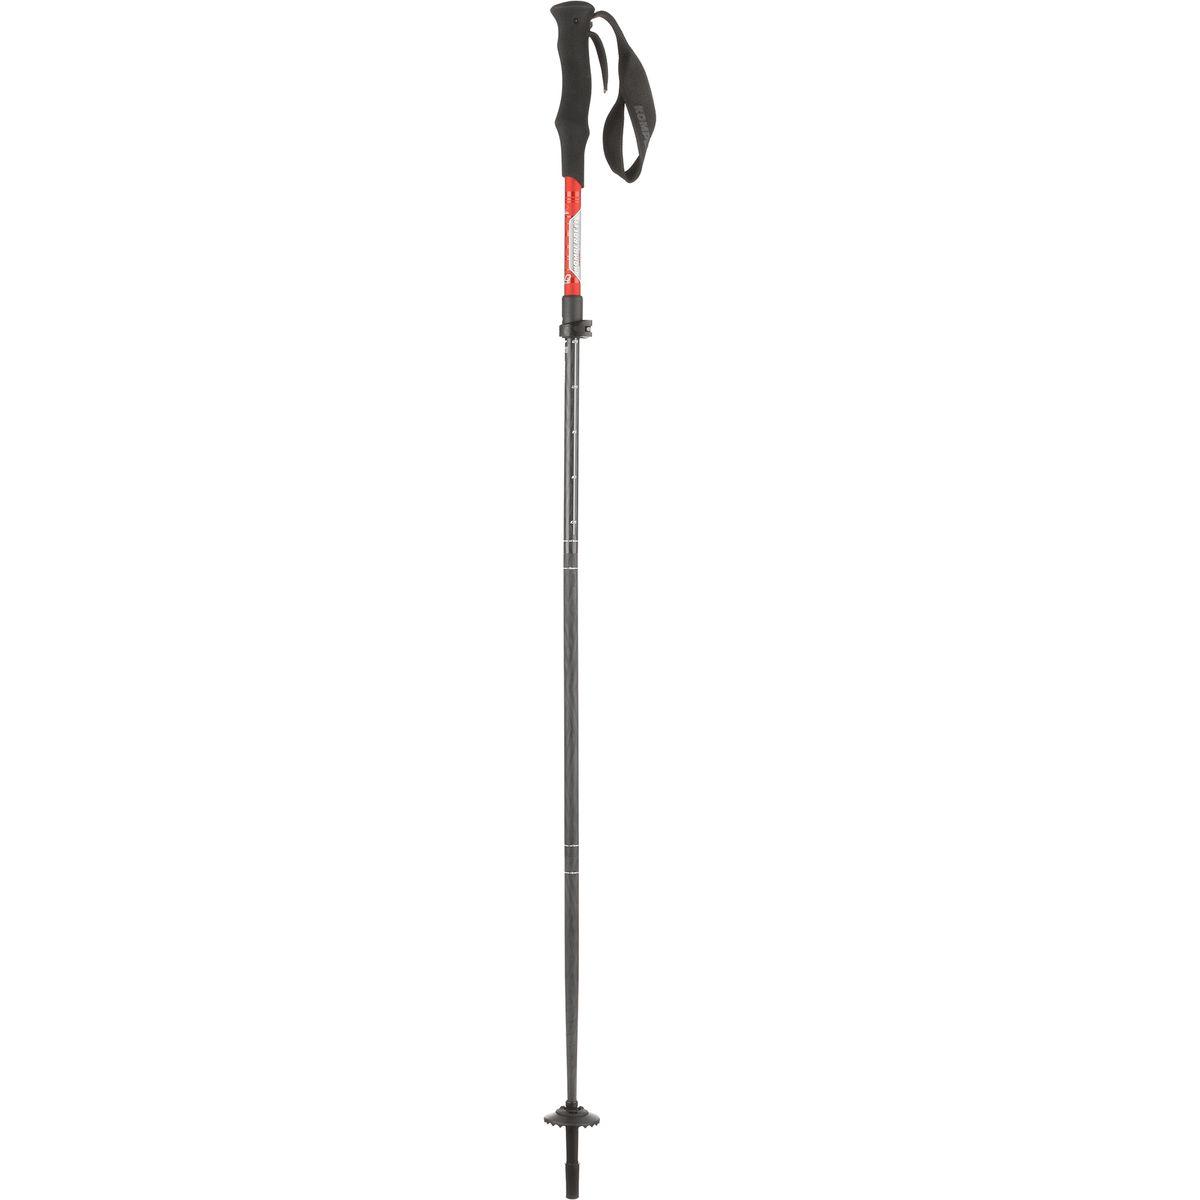 Komperdell Carbon Approach Vario 4 Compact Trekking Poles